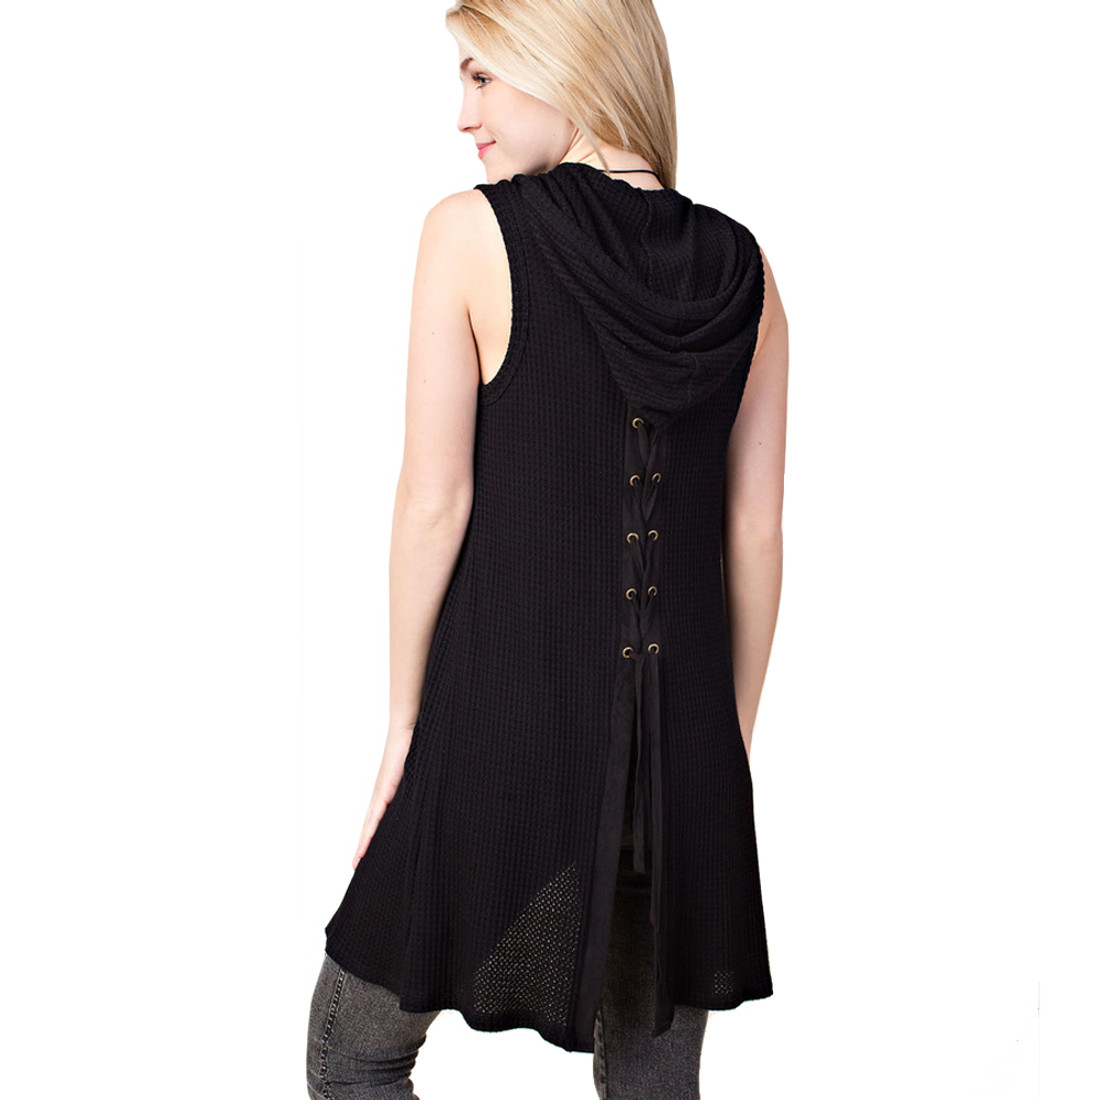 Vocal Apparel  Hoodie Vest